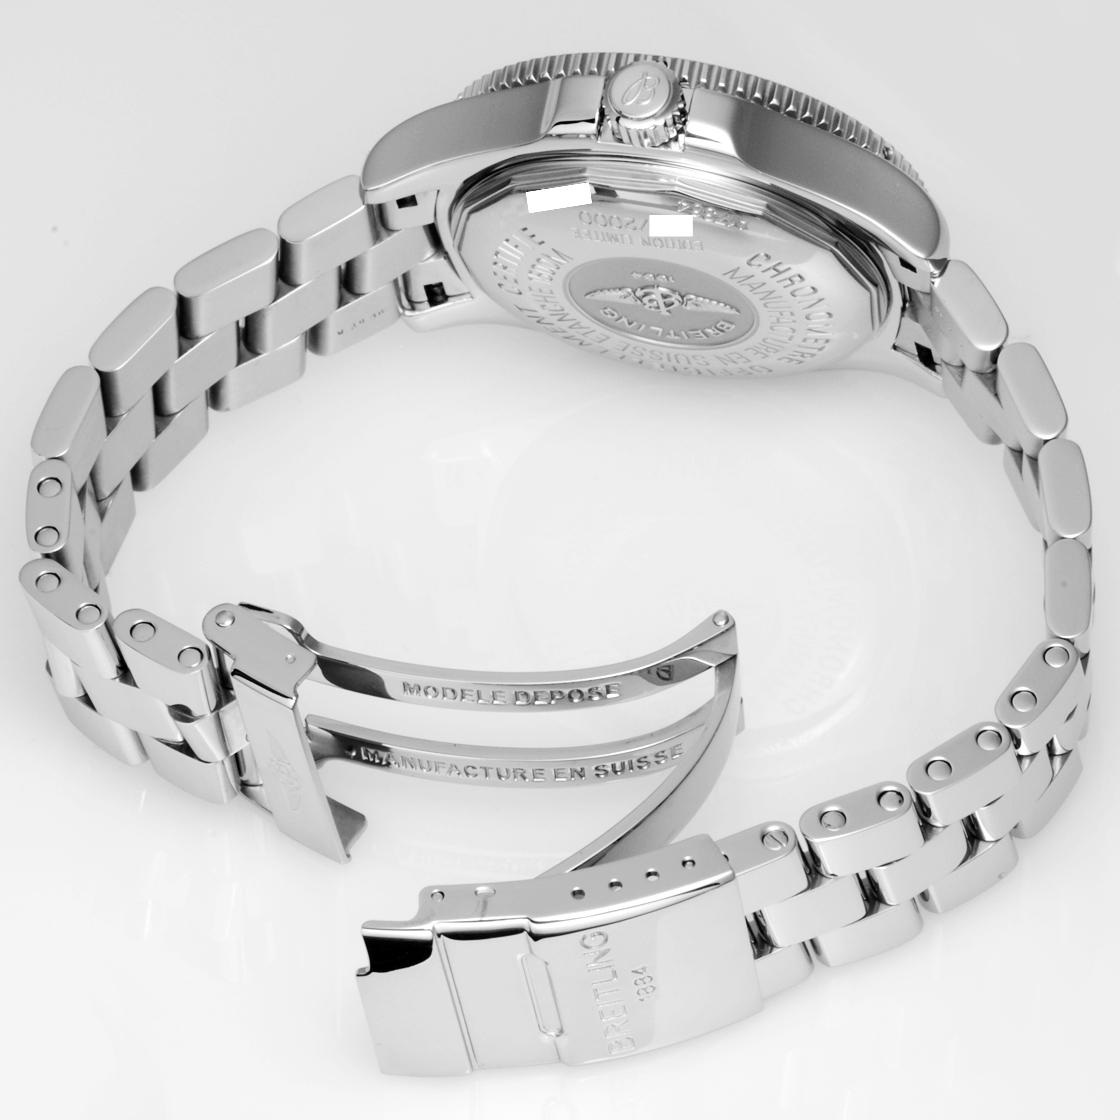 BRIGHT環A17364超級市場大海42深淵柳丁SS世界2000條限定自動卷人《罕見的罕見的型號!》